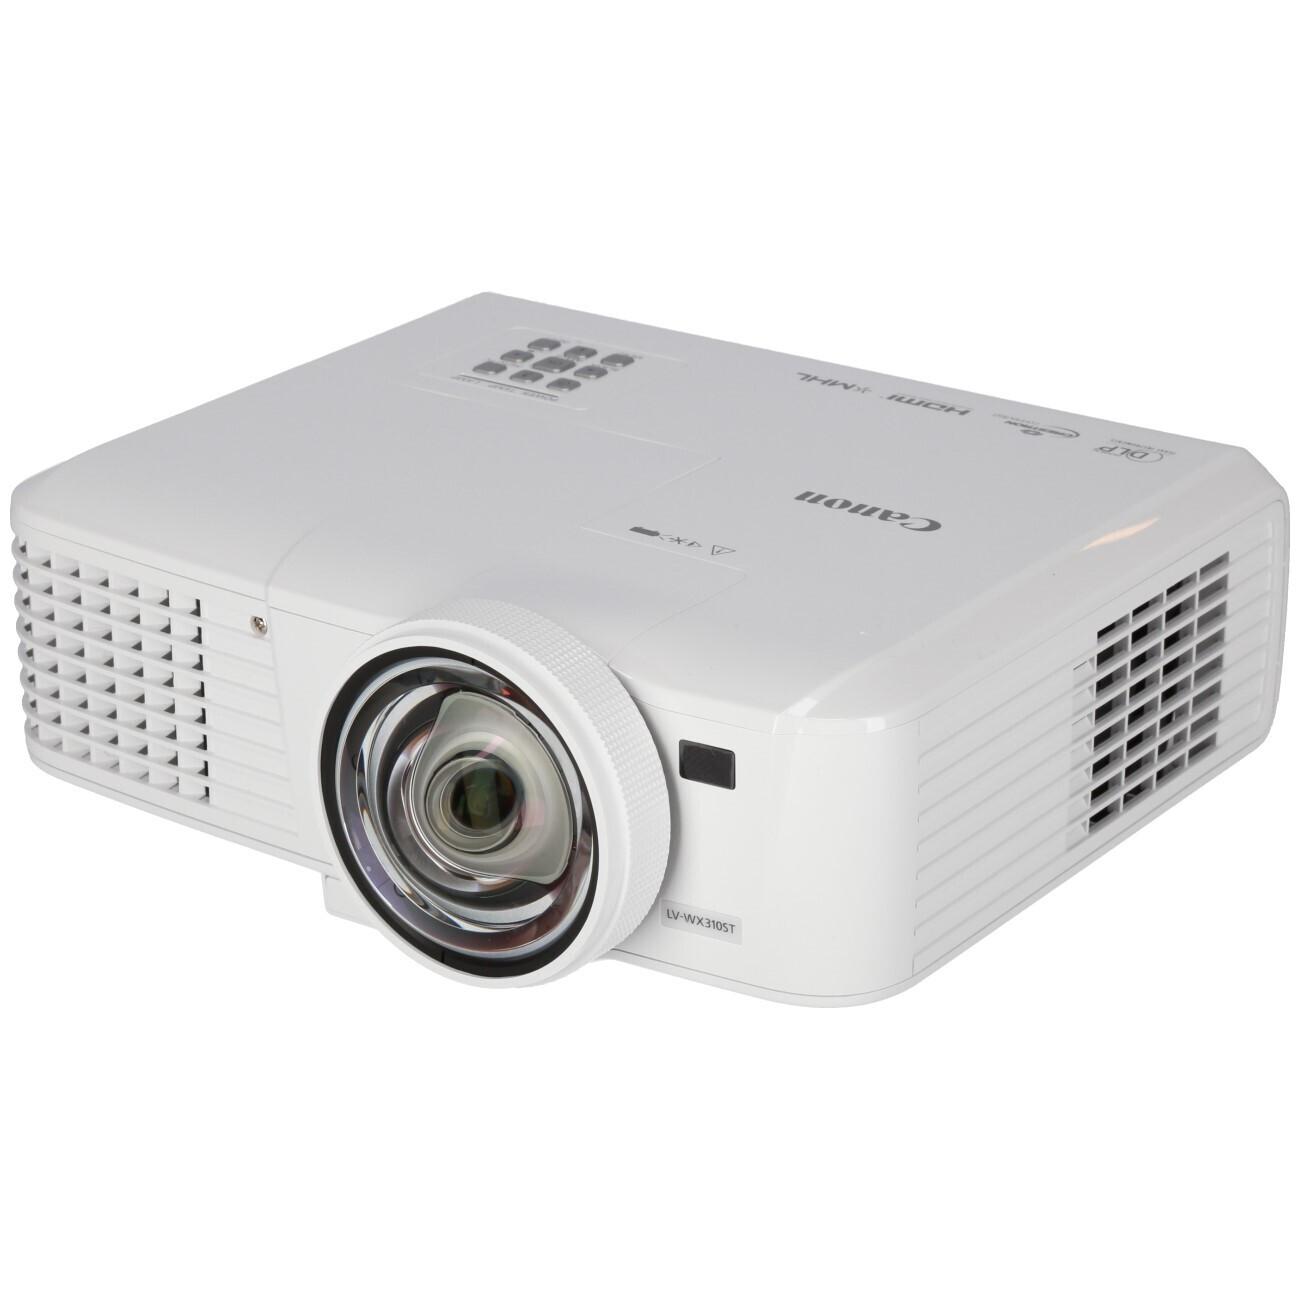 Canon LV-WX310ST Kurzdistanzbeamer mit 3100 ANSI-Lumen und WXGA